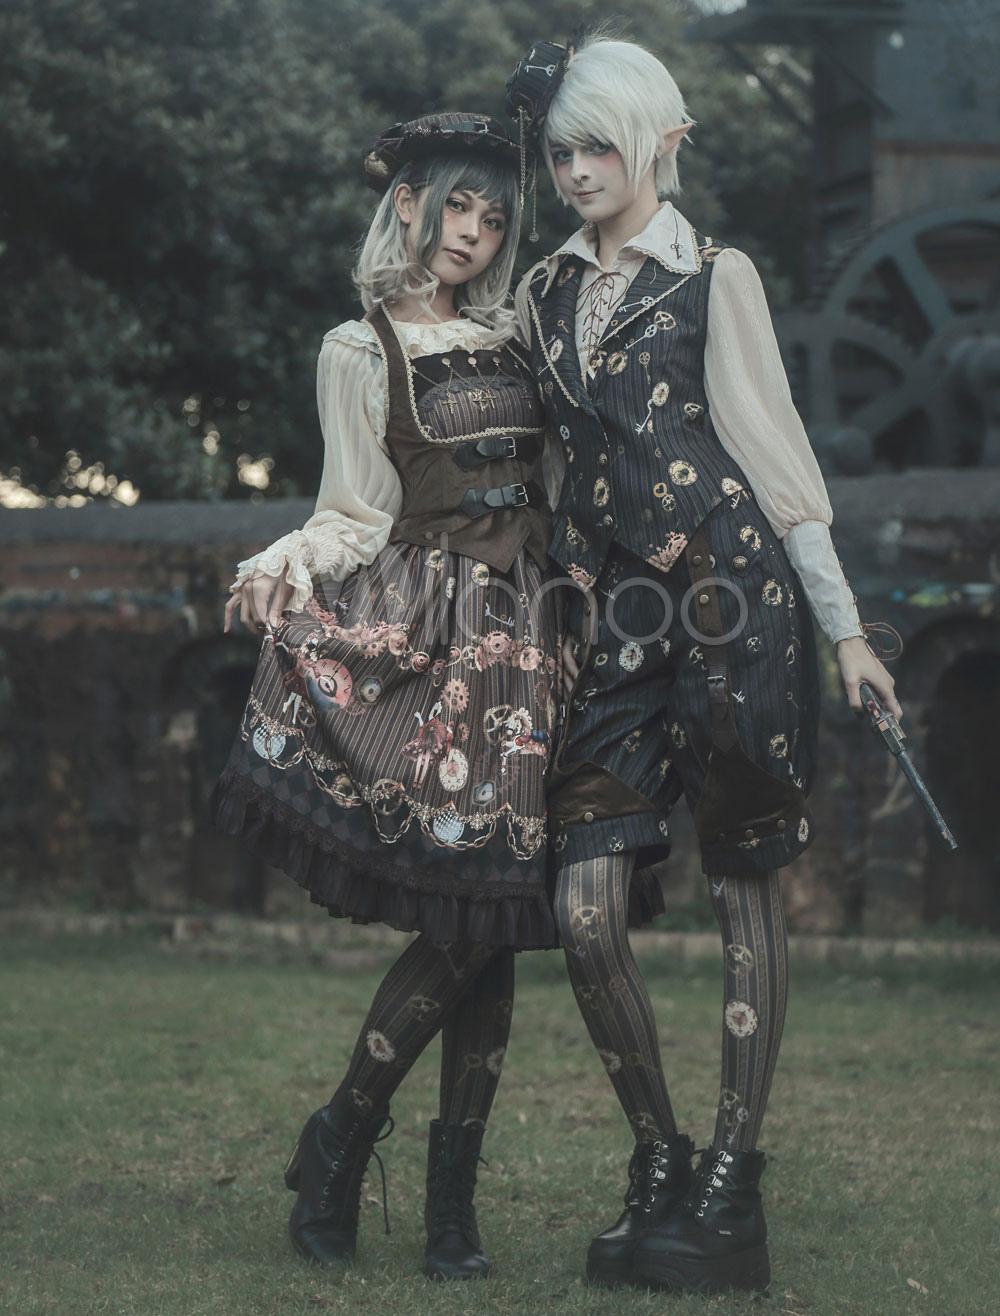 Steampunk Lolita Pants Infanta Black Chiffon Fairytale Print Pleated Lolita Bottoms